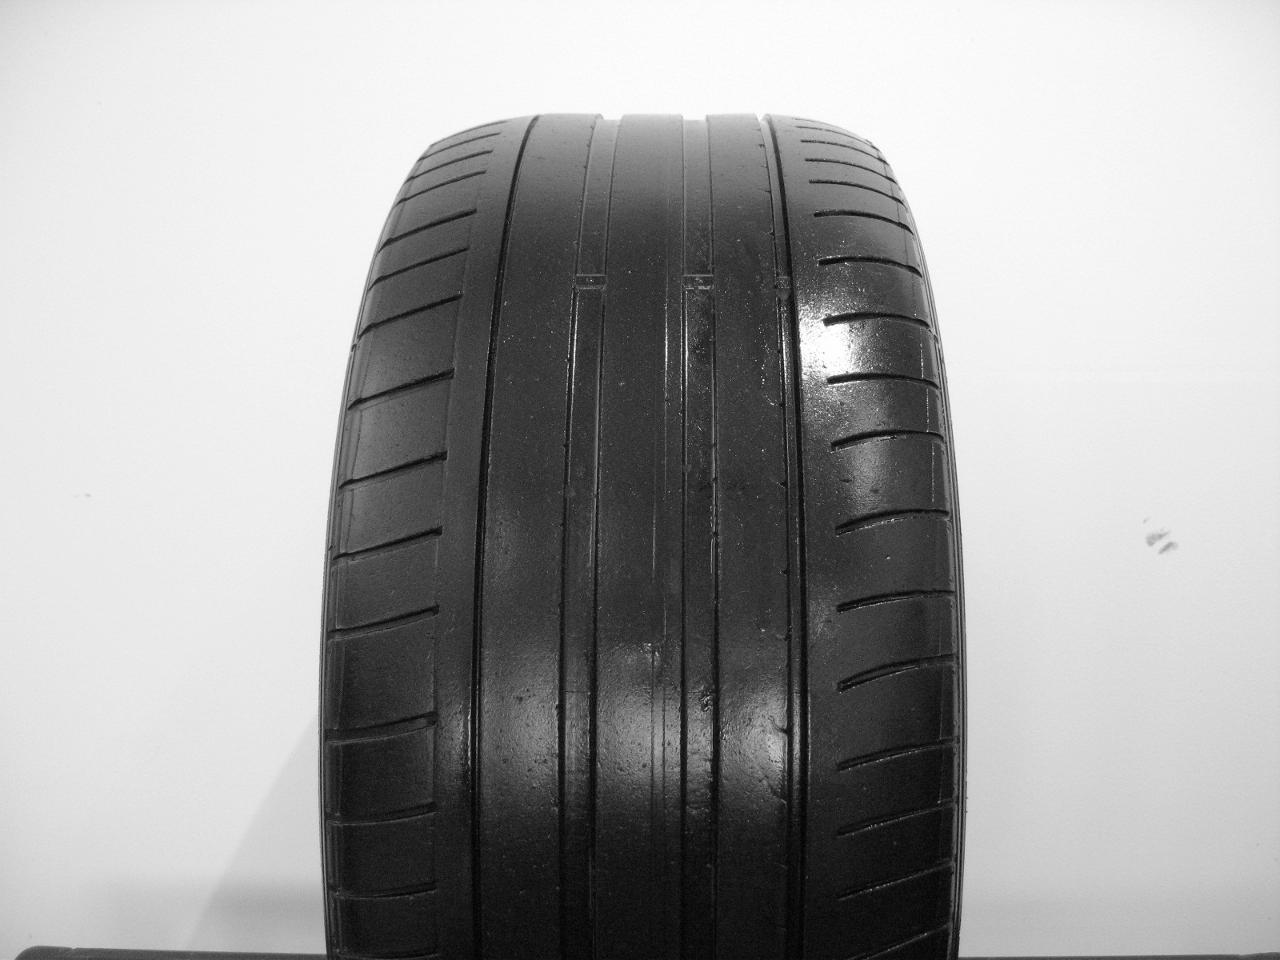 Použité-Pneu-Bazar - 255/40 R19 DUNLOP SP SPORT MAXX GT -kusovka-rezerva 3mm